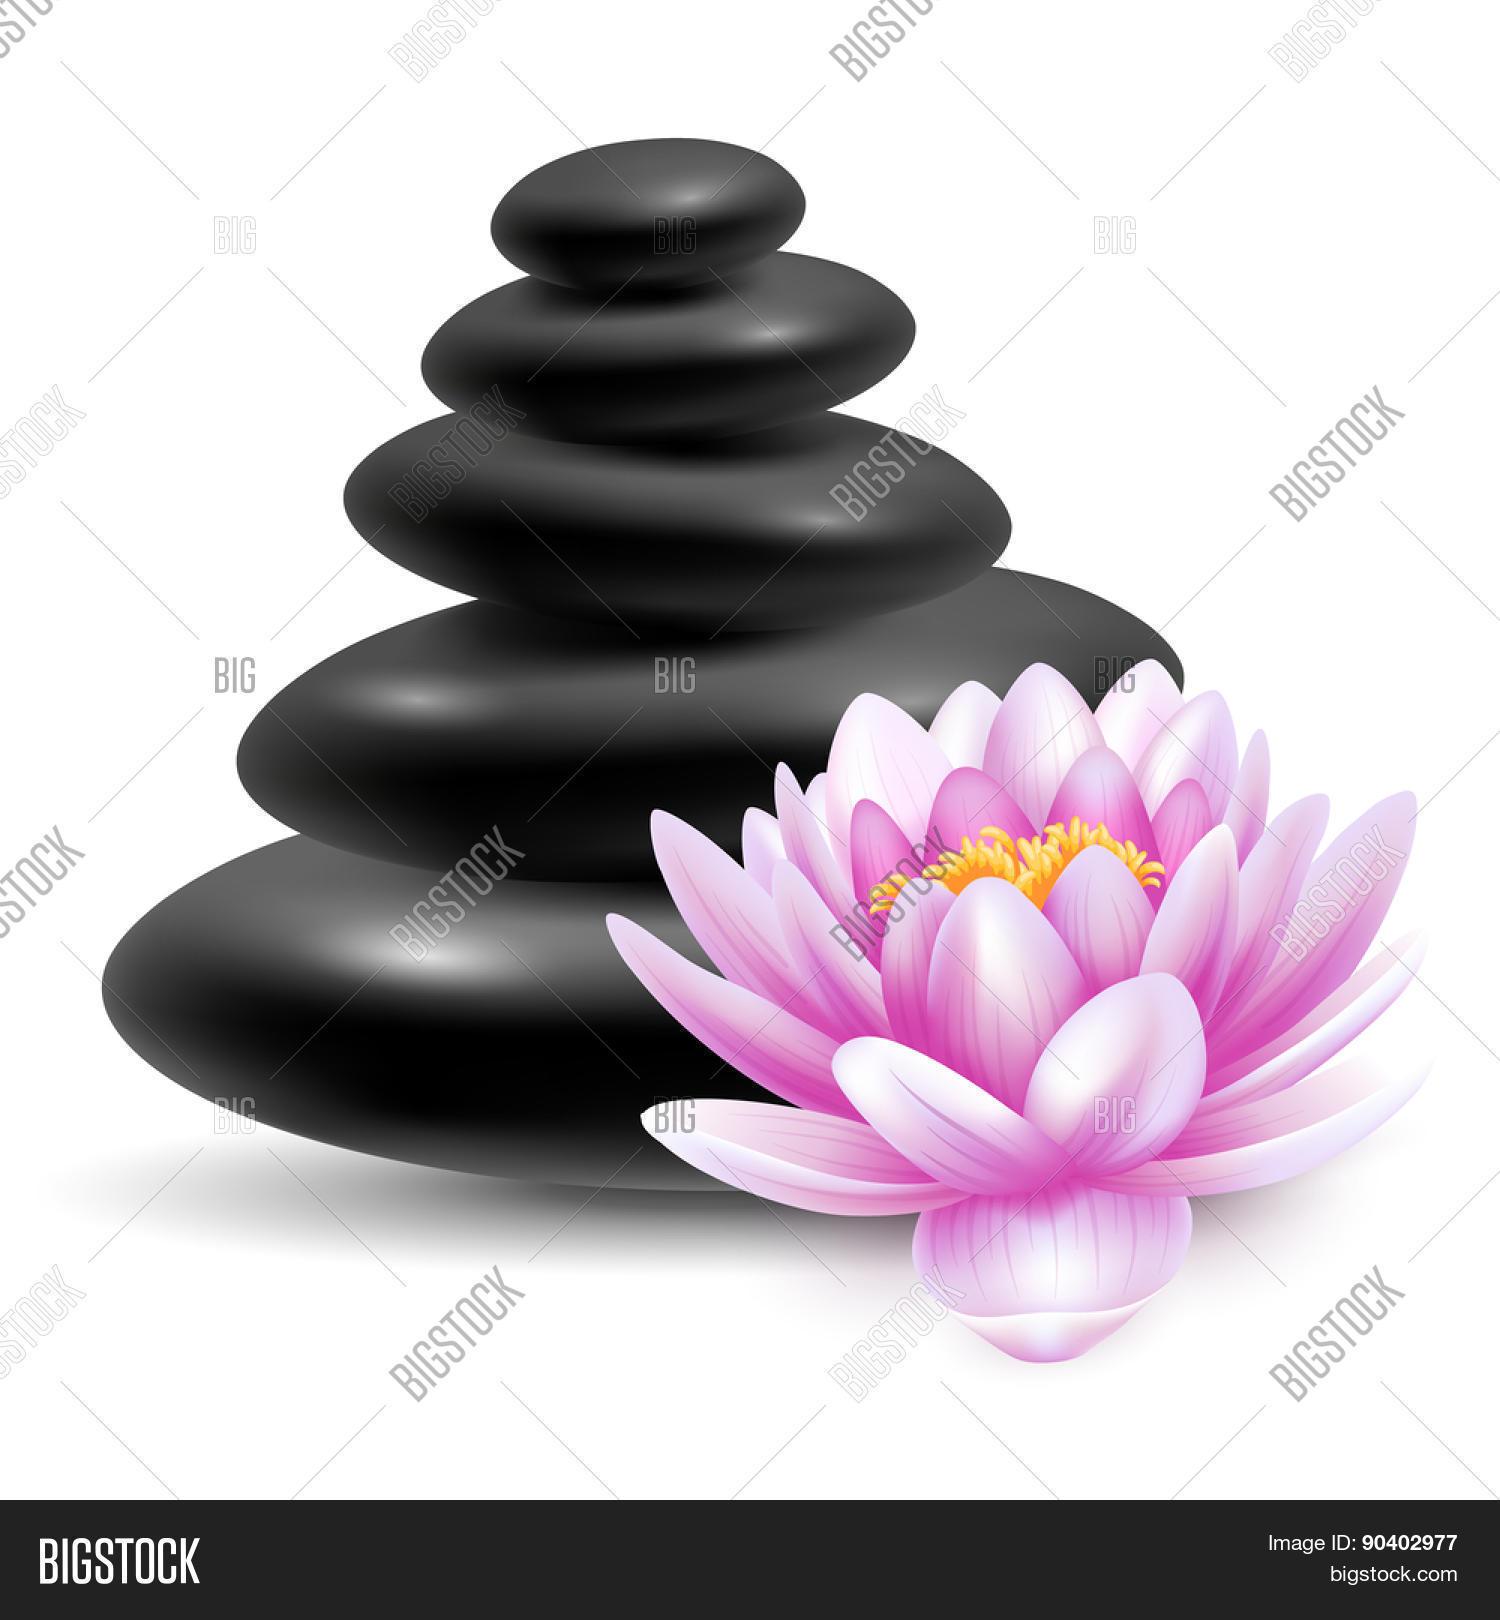 Spa still life black vector photo free trial bigstock spa still life with black massage stones and pink lotus flower vector illustration isolated izmirmasajfo